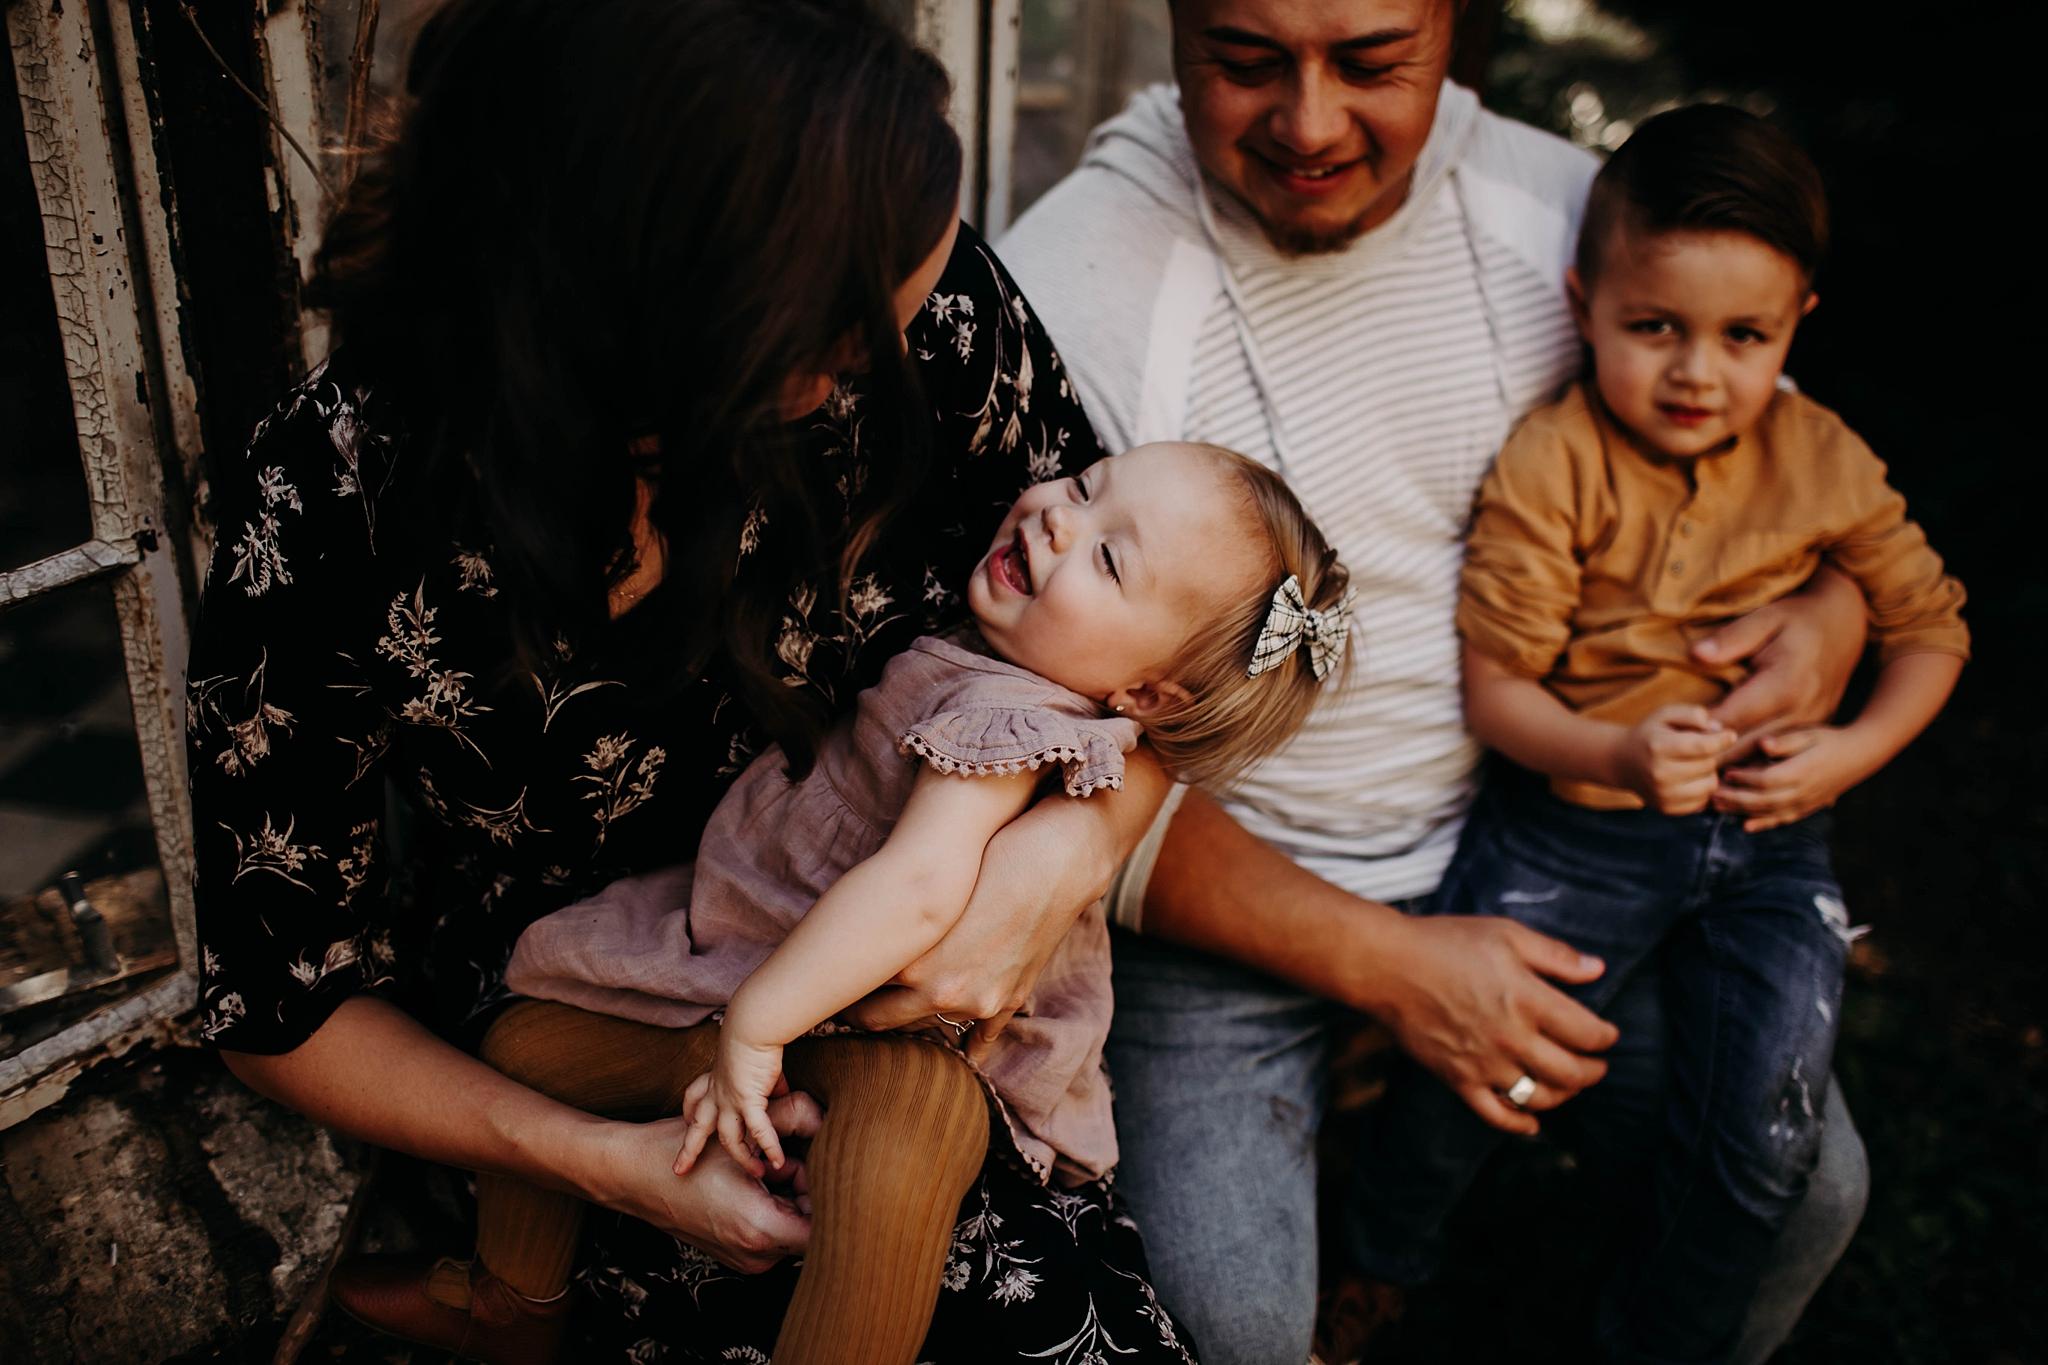 Luera-VMP-San-Antonio-Family-Photography-15_WEB.jpg